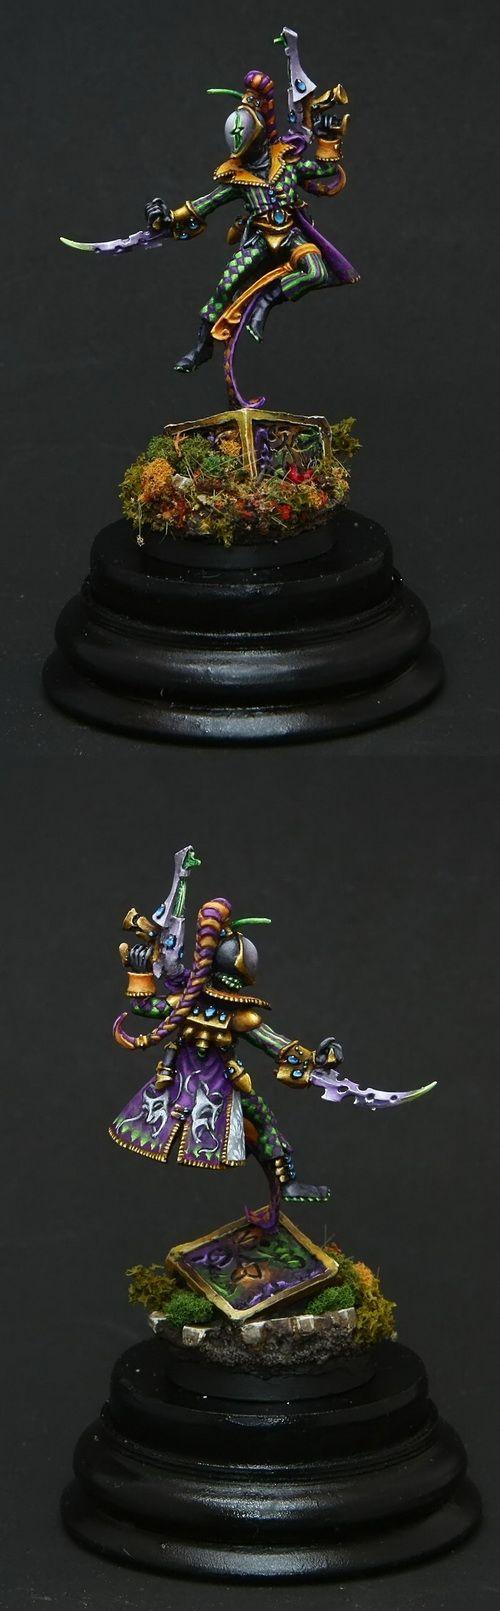 sweet eldar harlequin